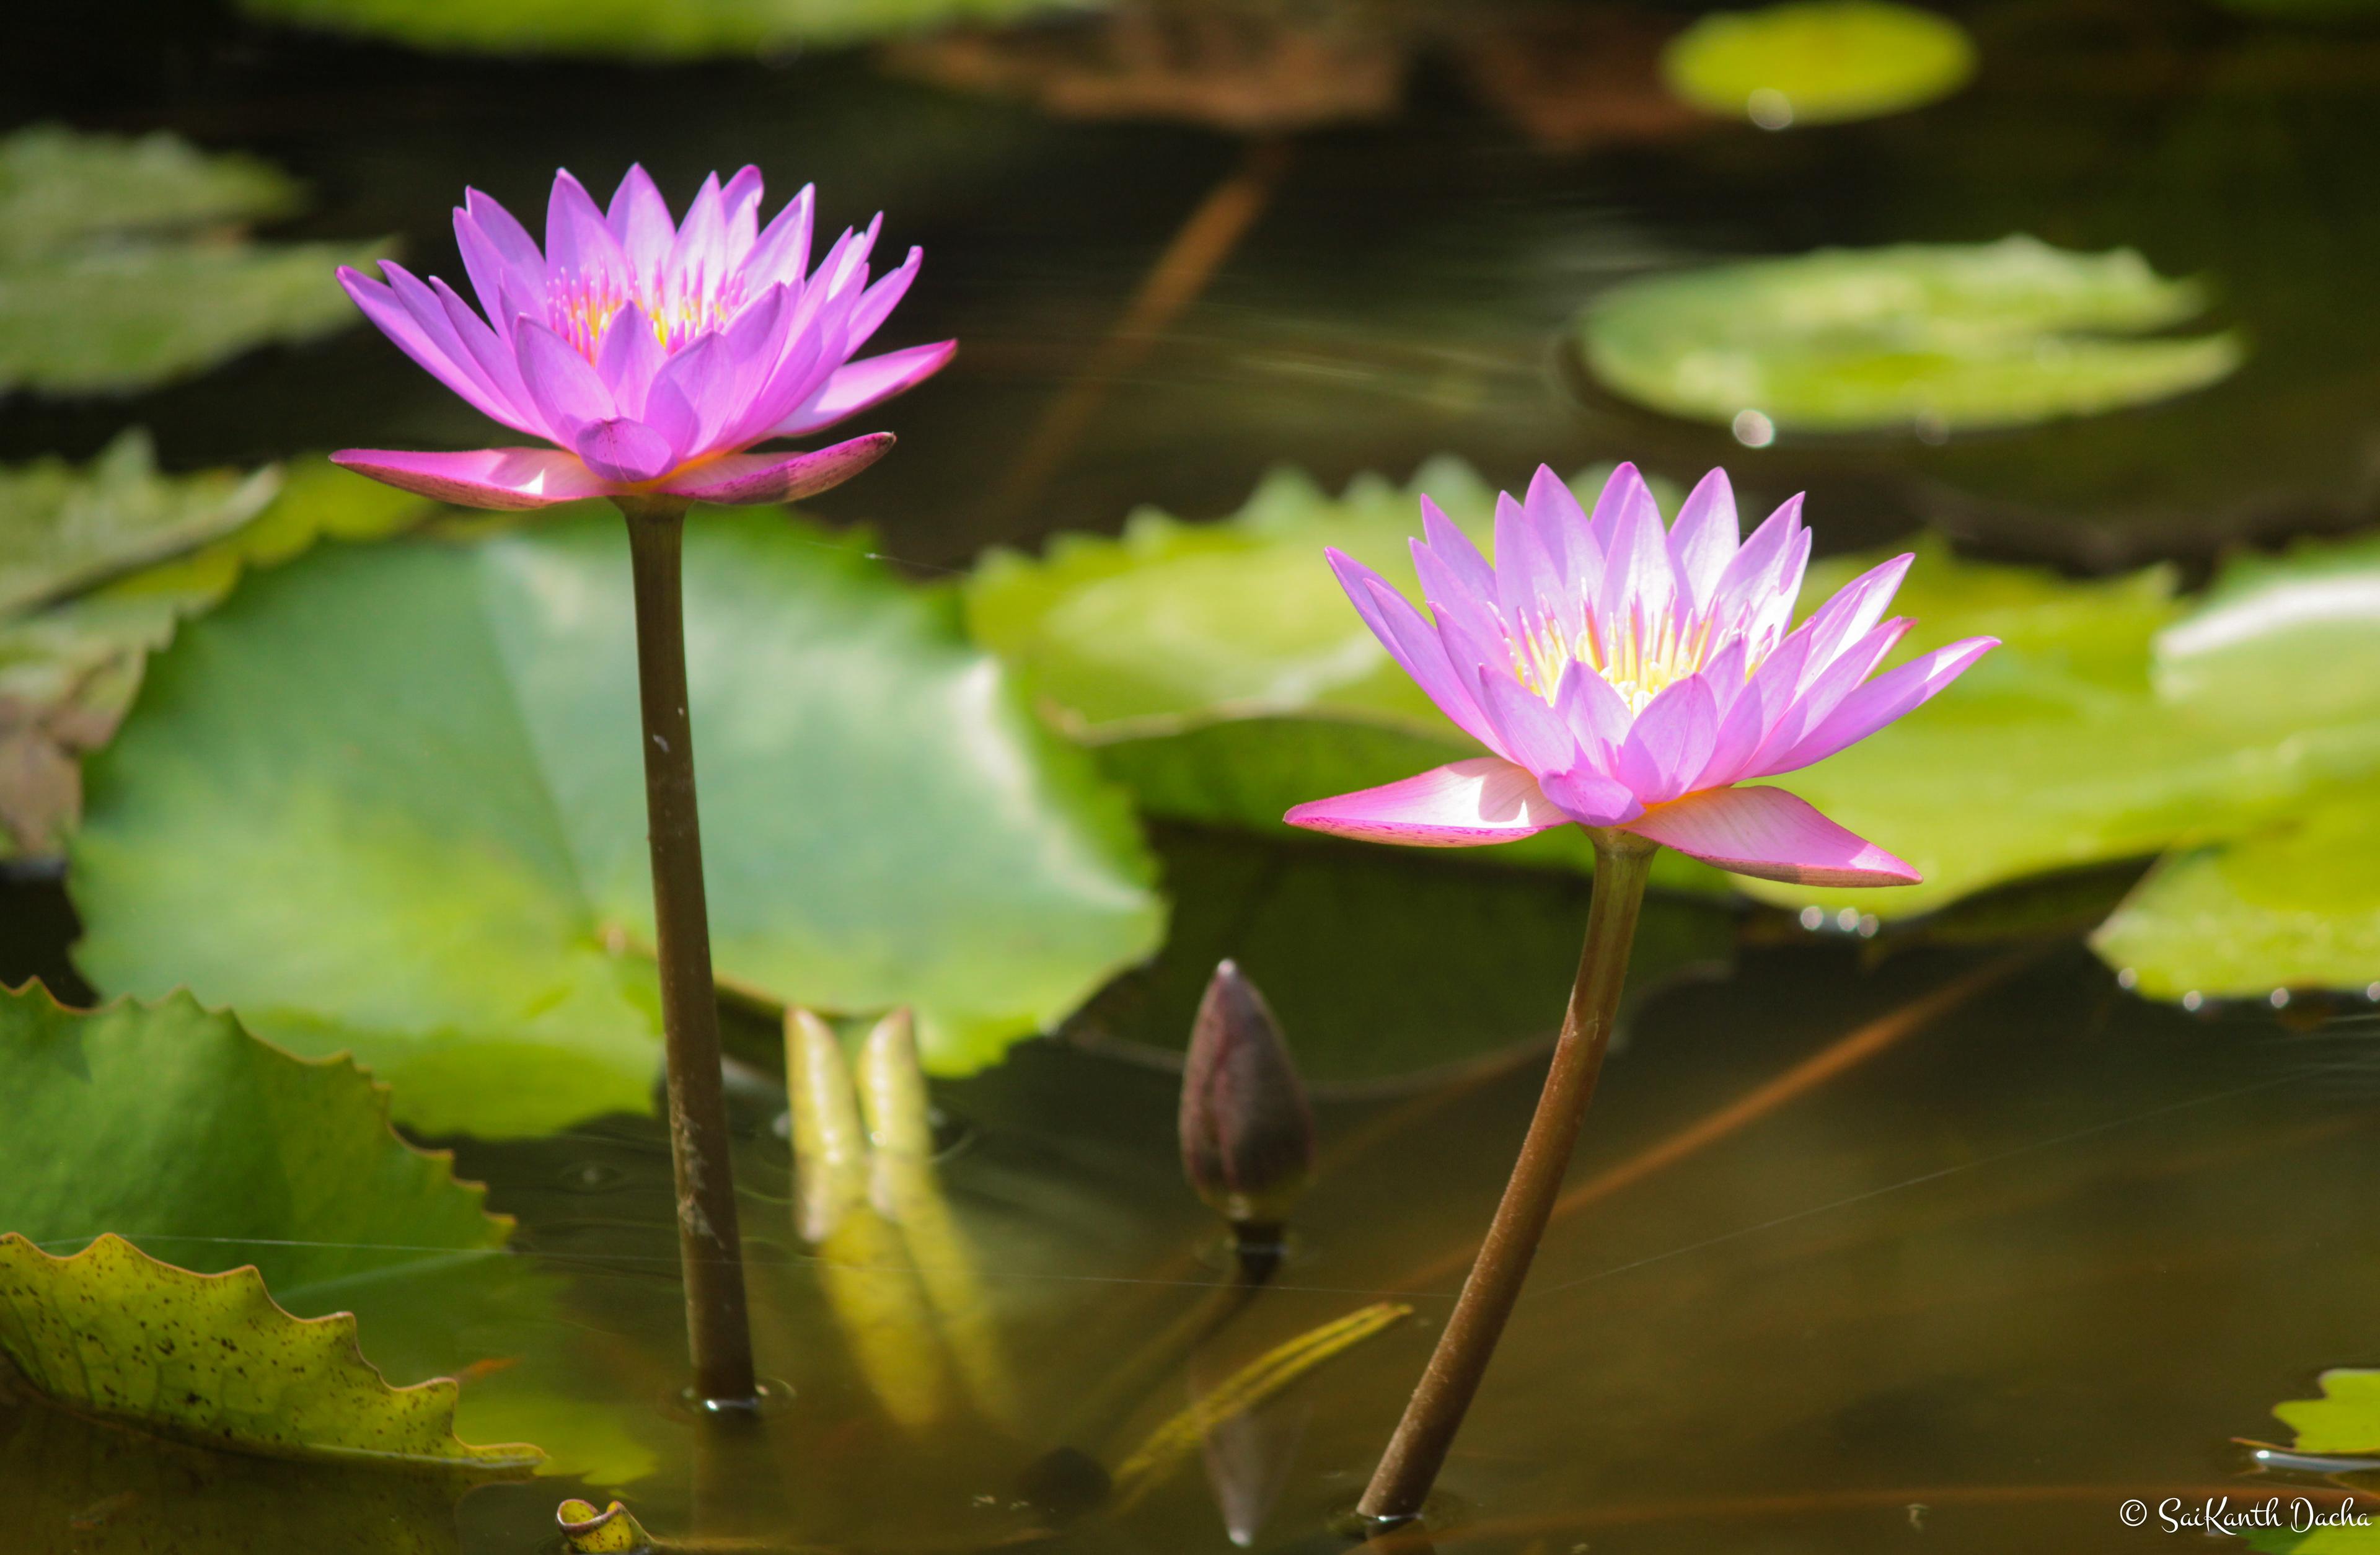 Sai kanth dacha flora lavender water lily in pondicherry tamil nadu india izmirmasajfo